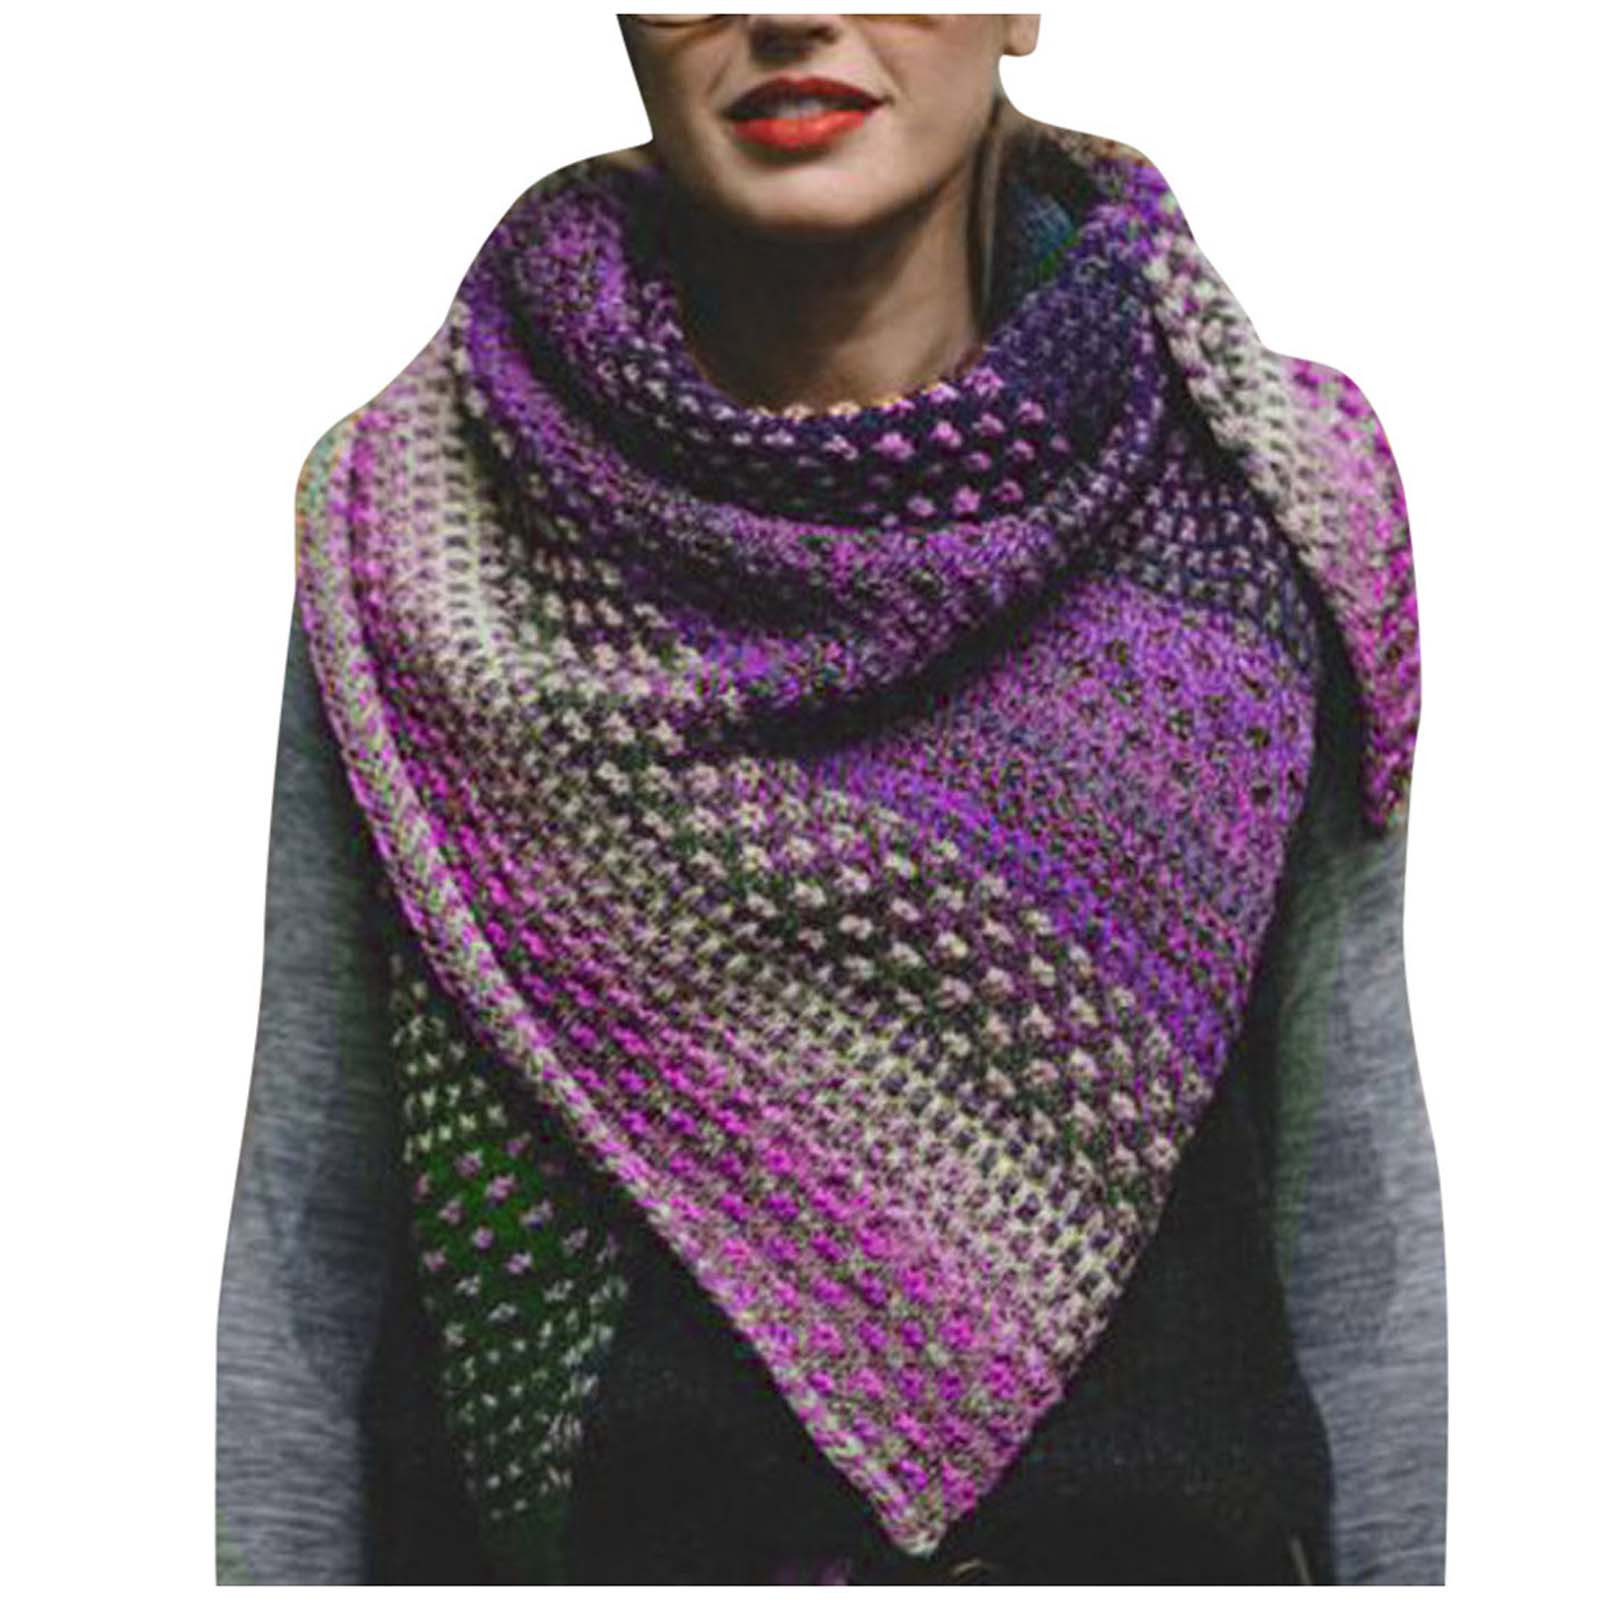 2020 Scarf Women Winter Warm Sided Colorful Color Crochet Thickened Knit Soft Shawl Scarf шарф женский зимний